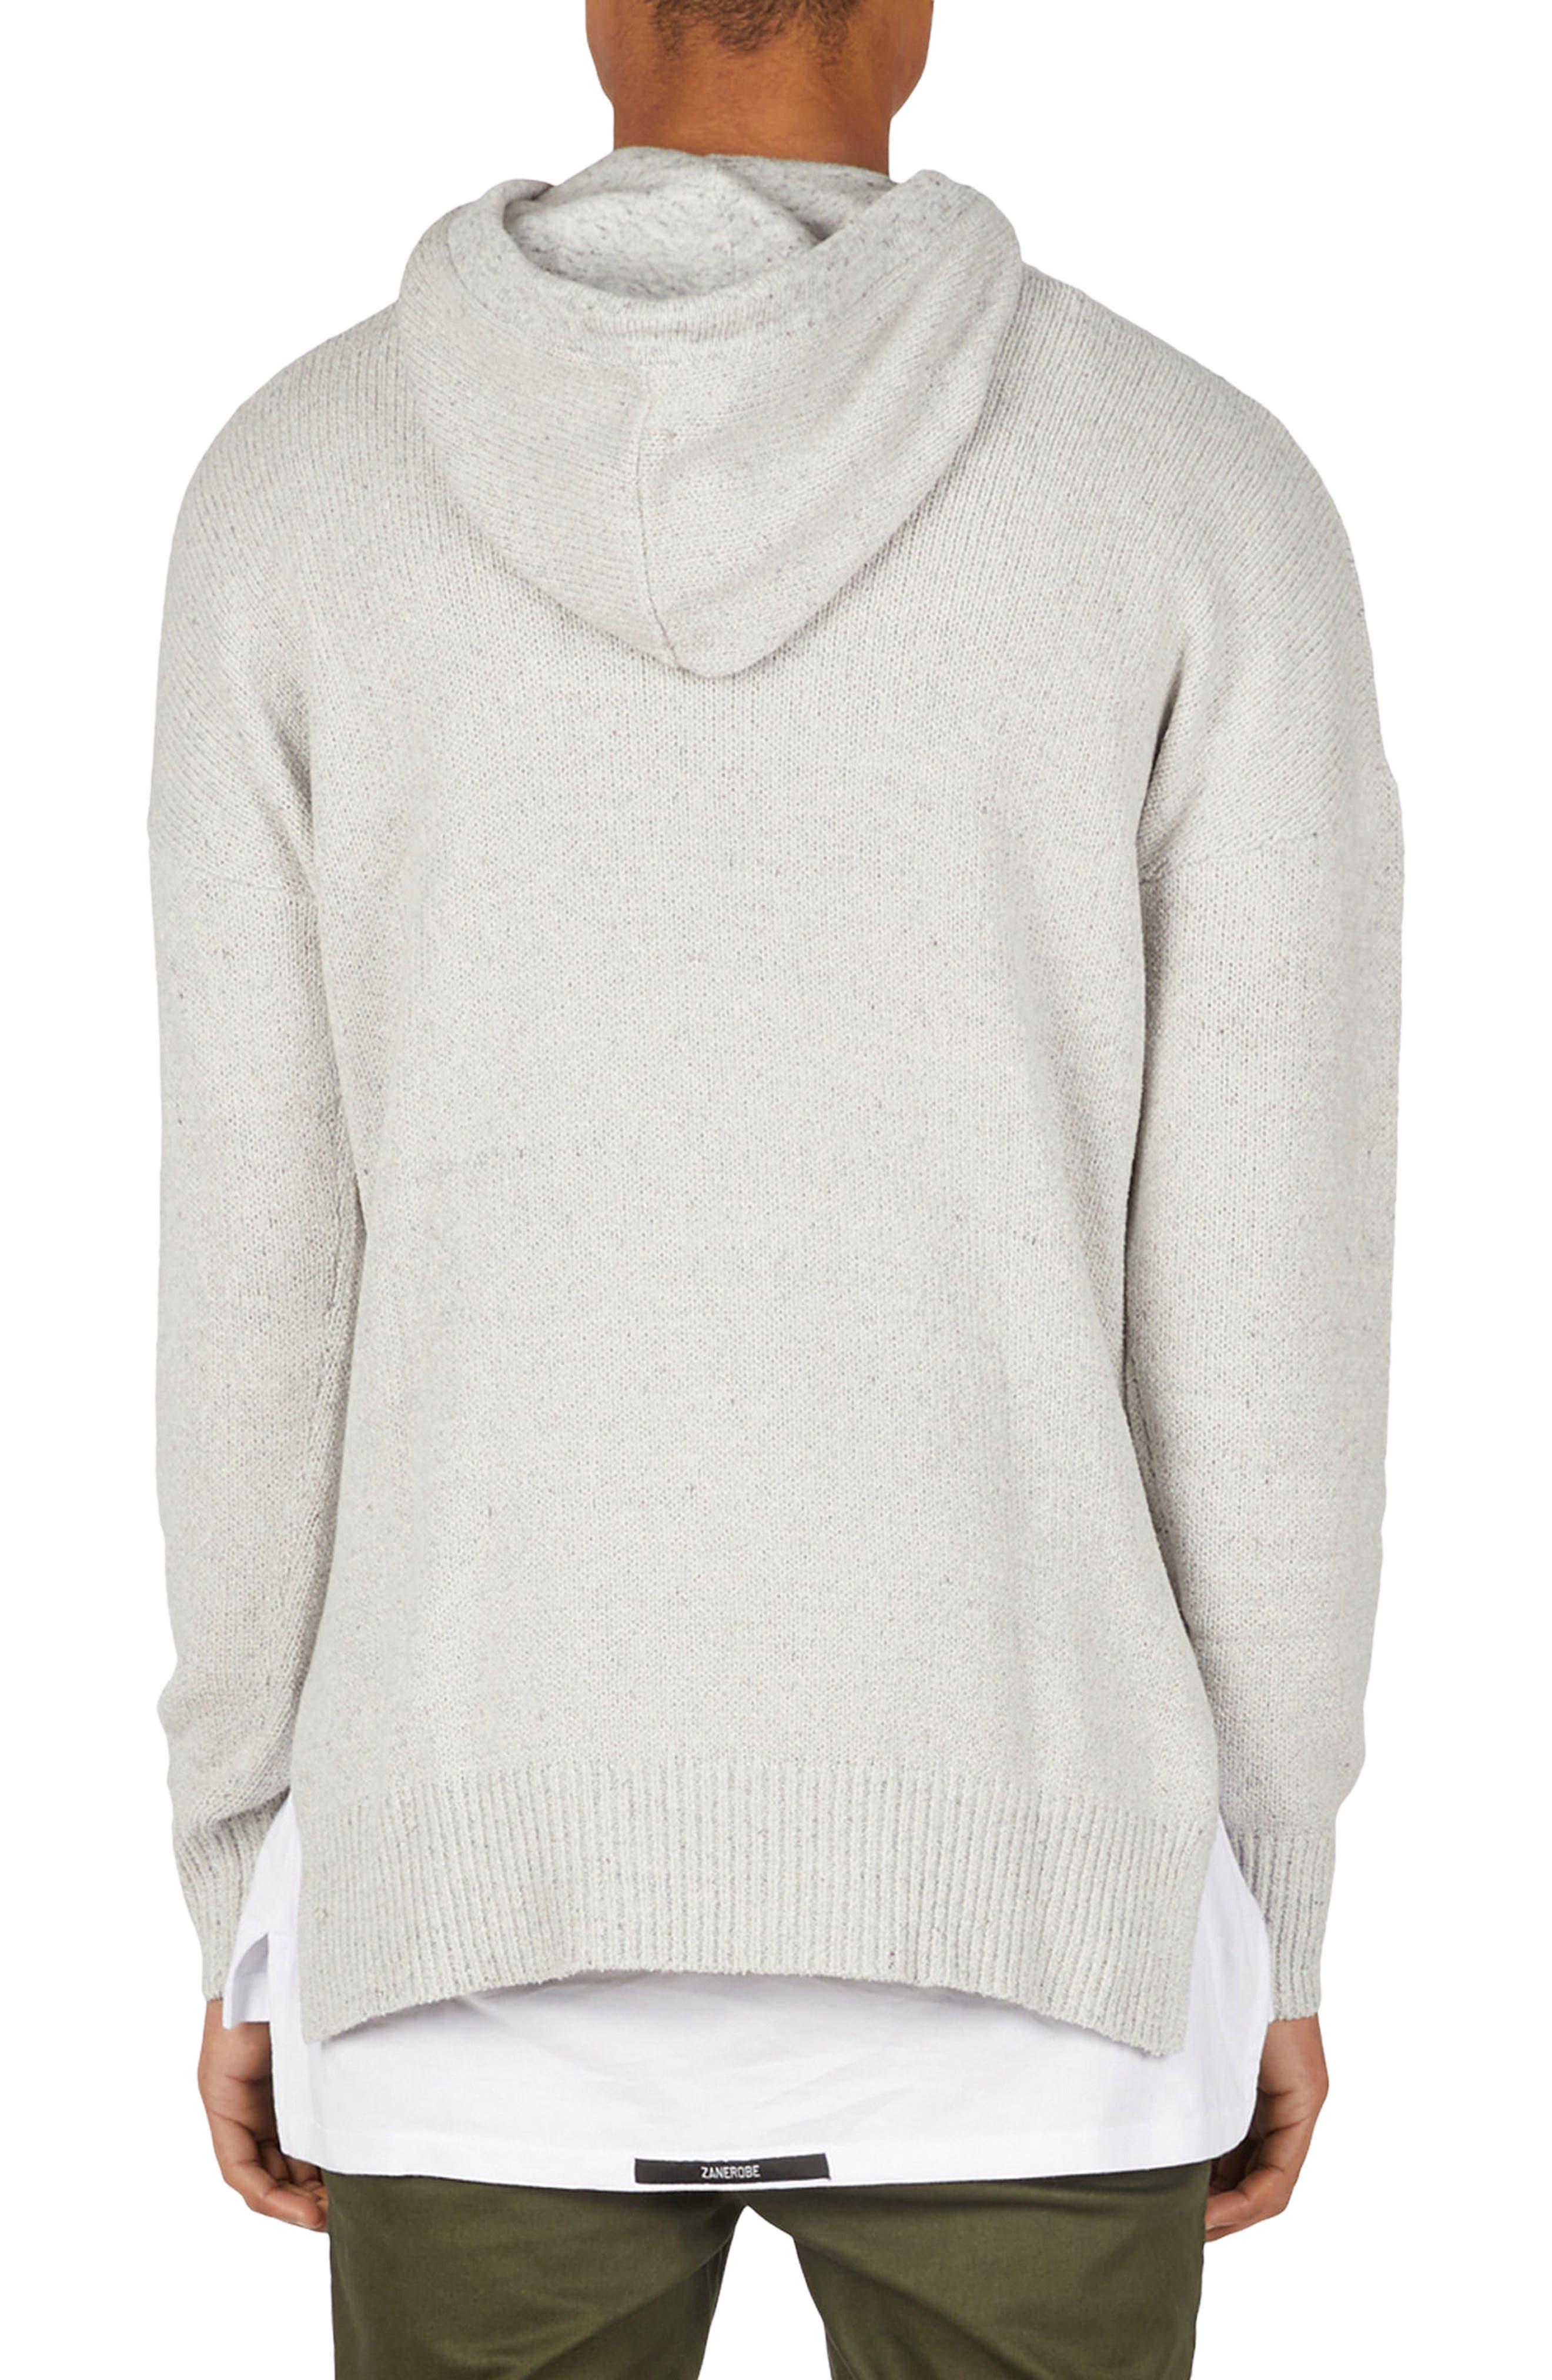 Towel Knit Hooded Sweatshirt,                             Alternate thumbnail 2, color,                             Grey